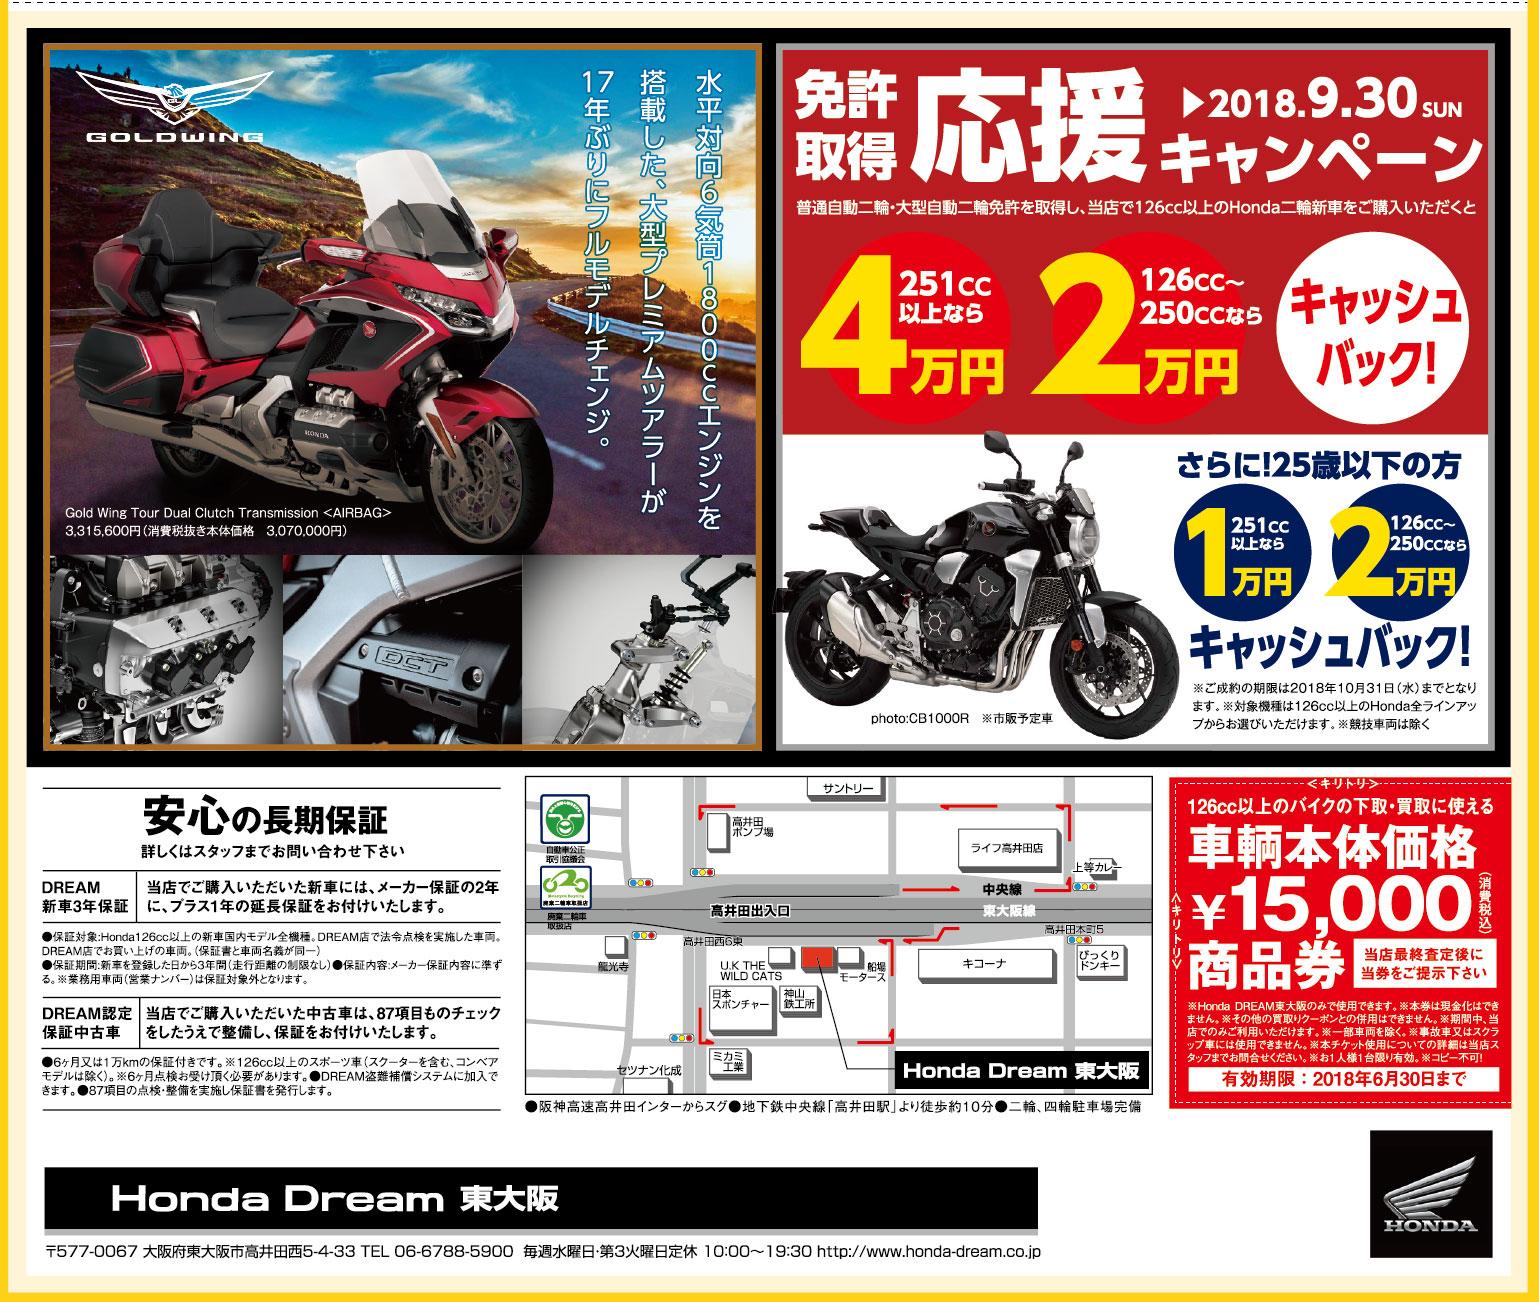 HONDA DREAM(ホンダドリーム)東大阪